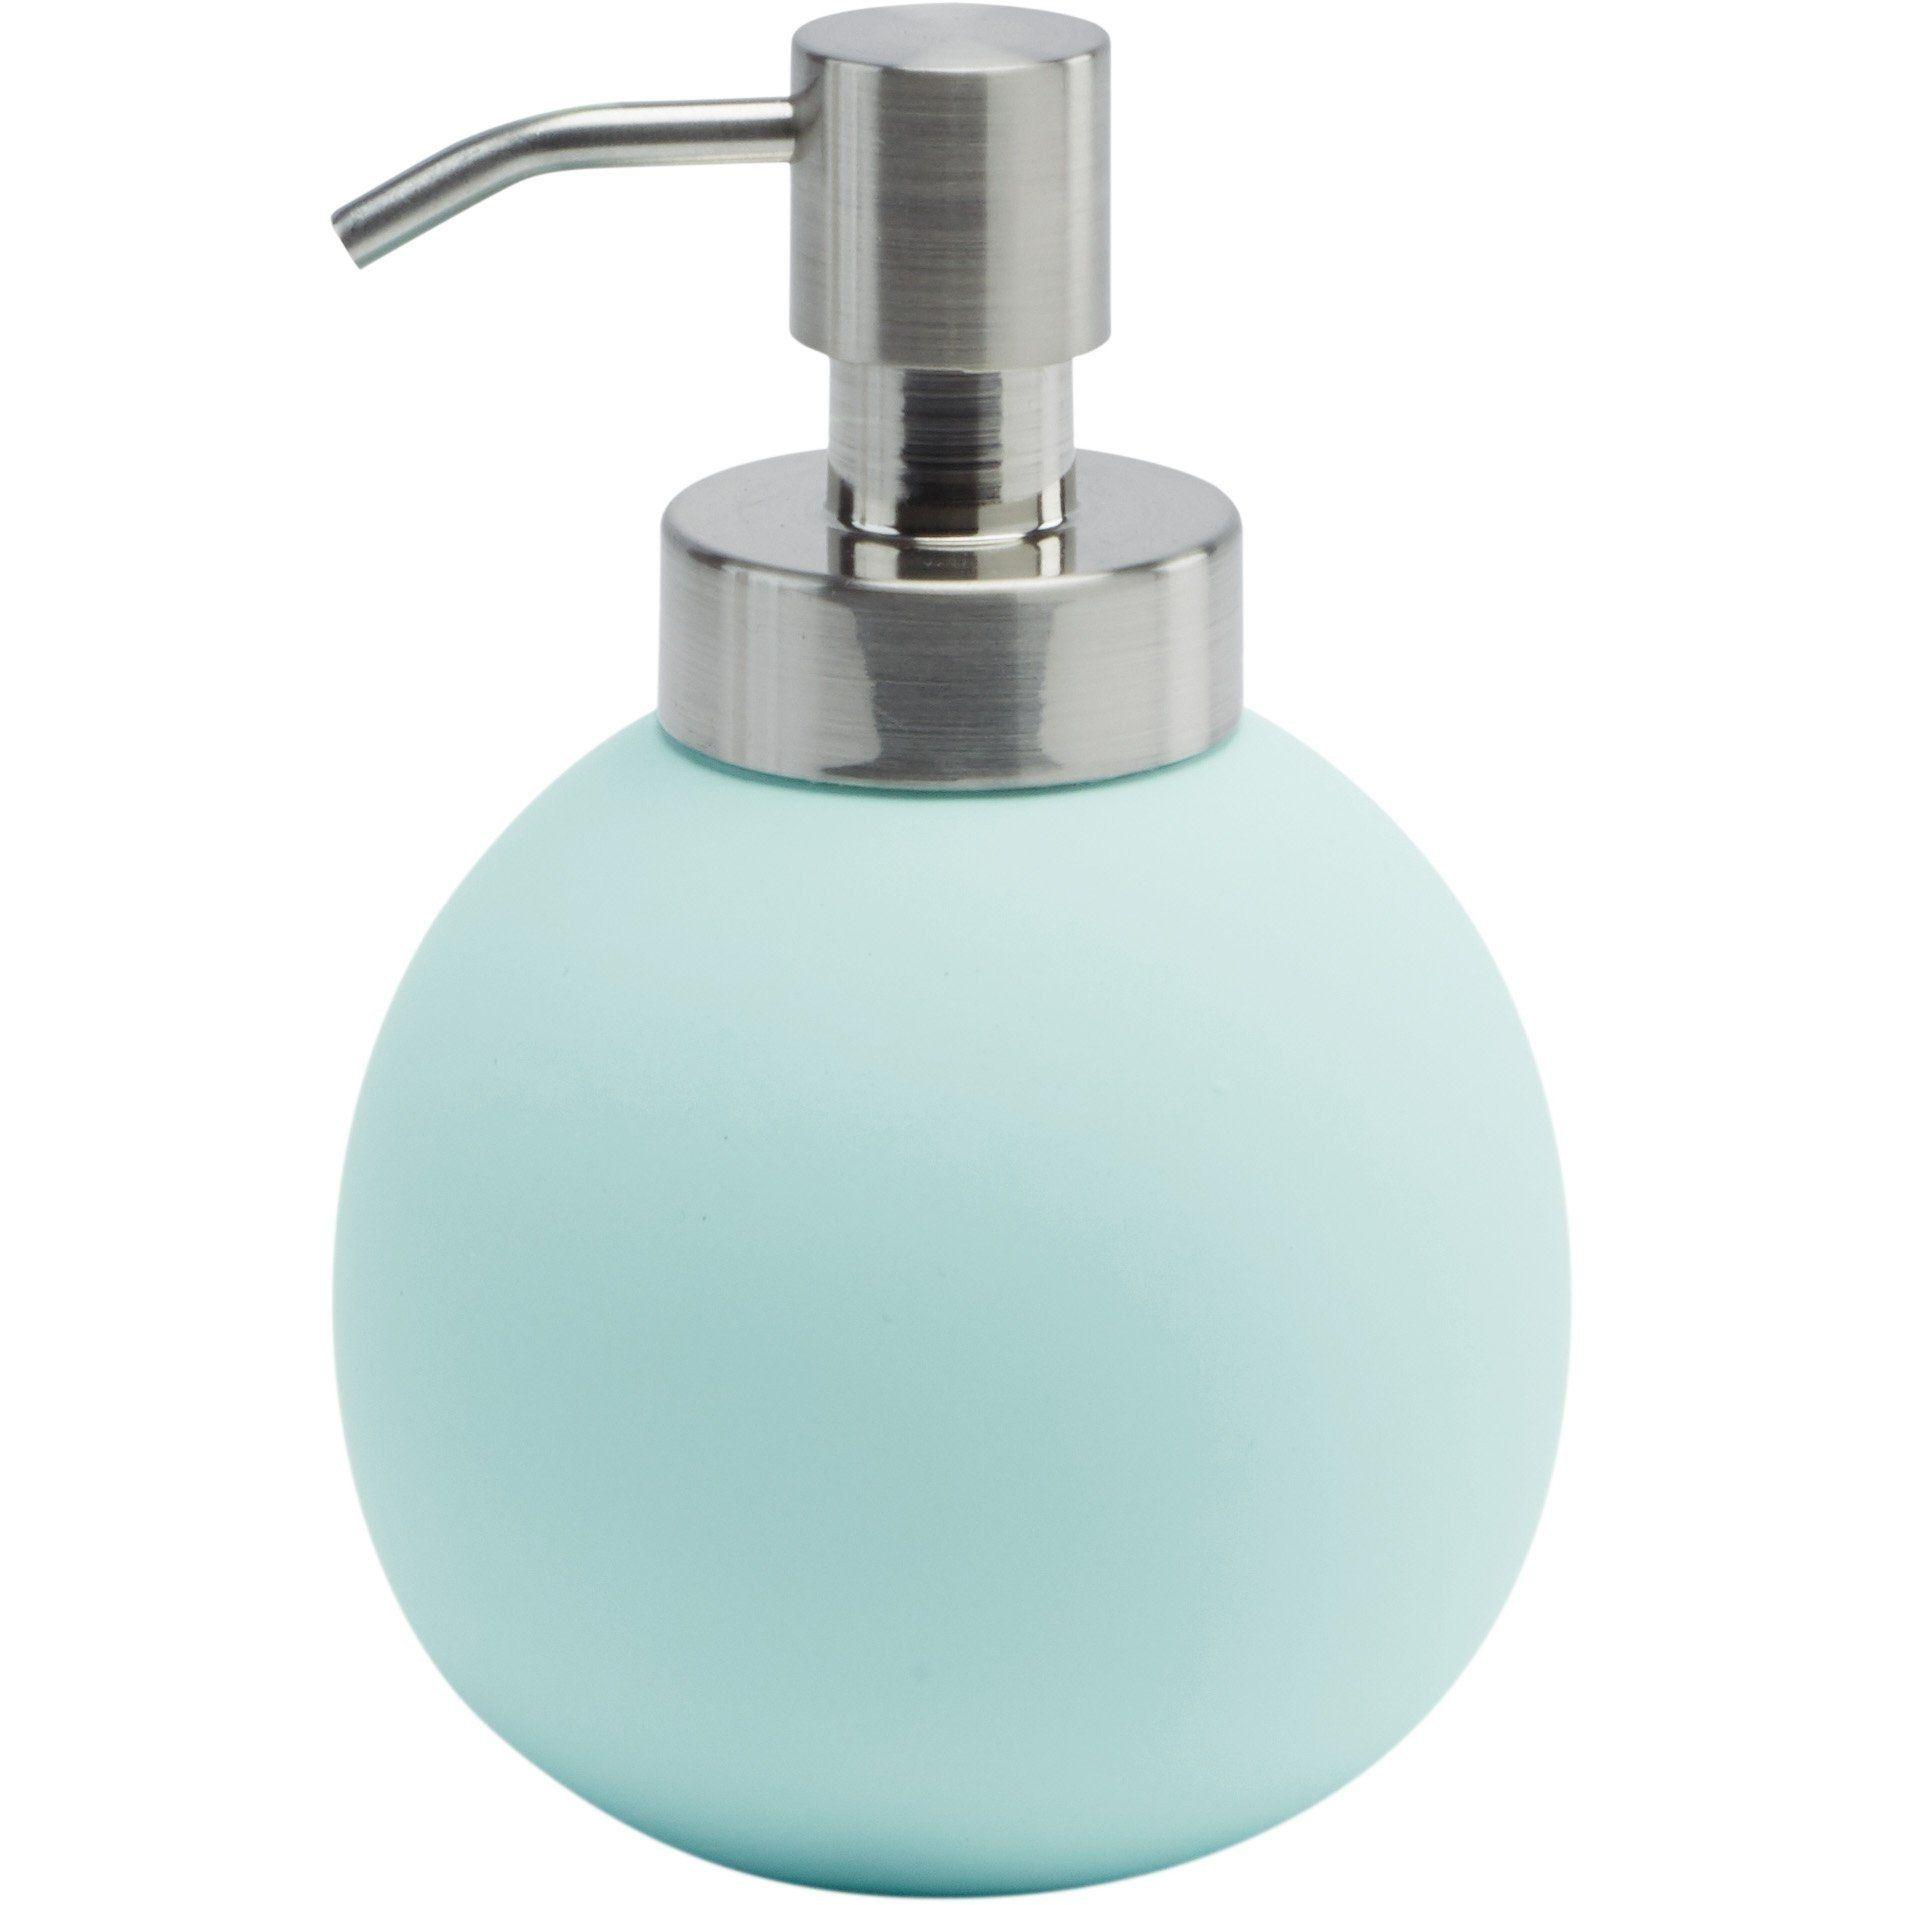 Cleo Compact Round Bath or Kitchen Pump Liquid Soap Lotion Dispenser ...